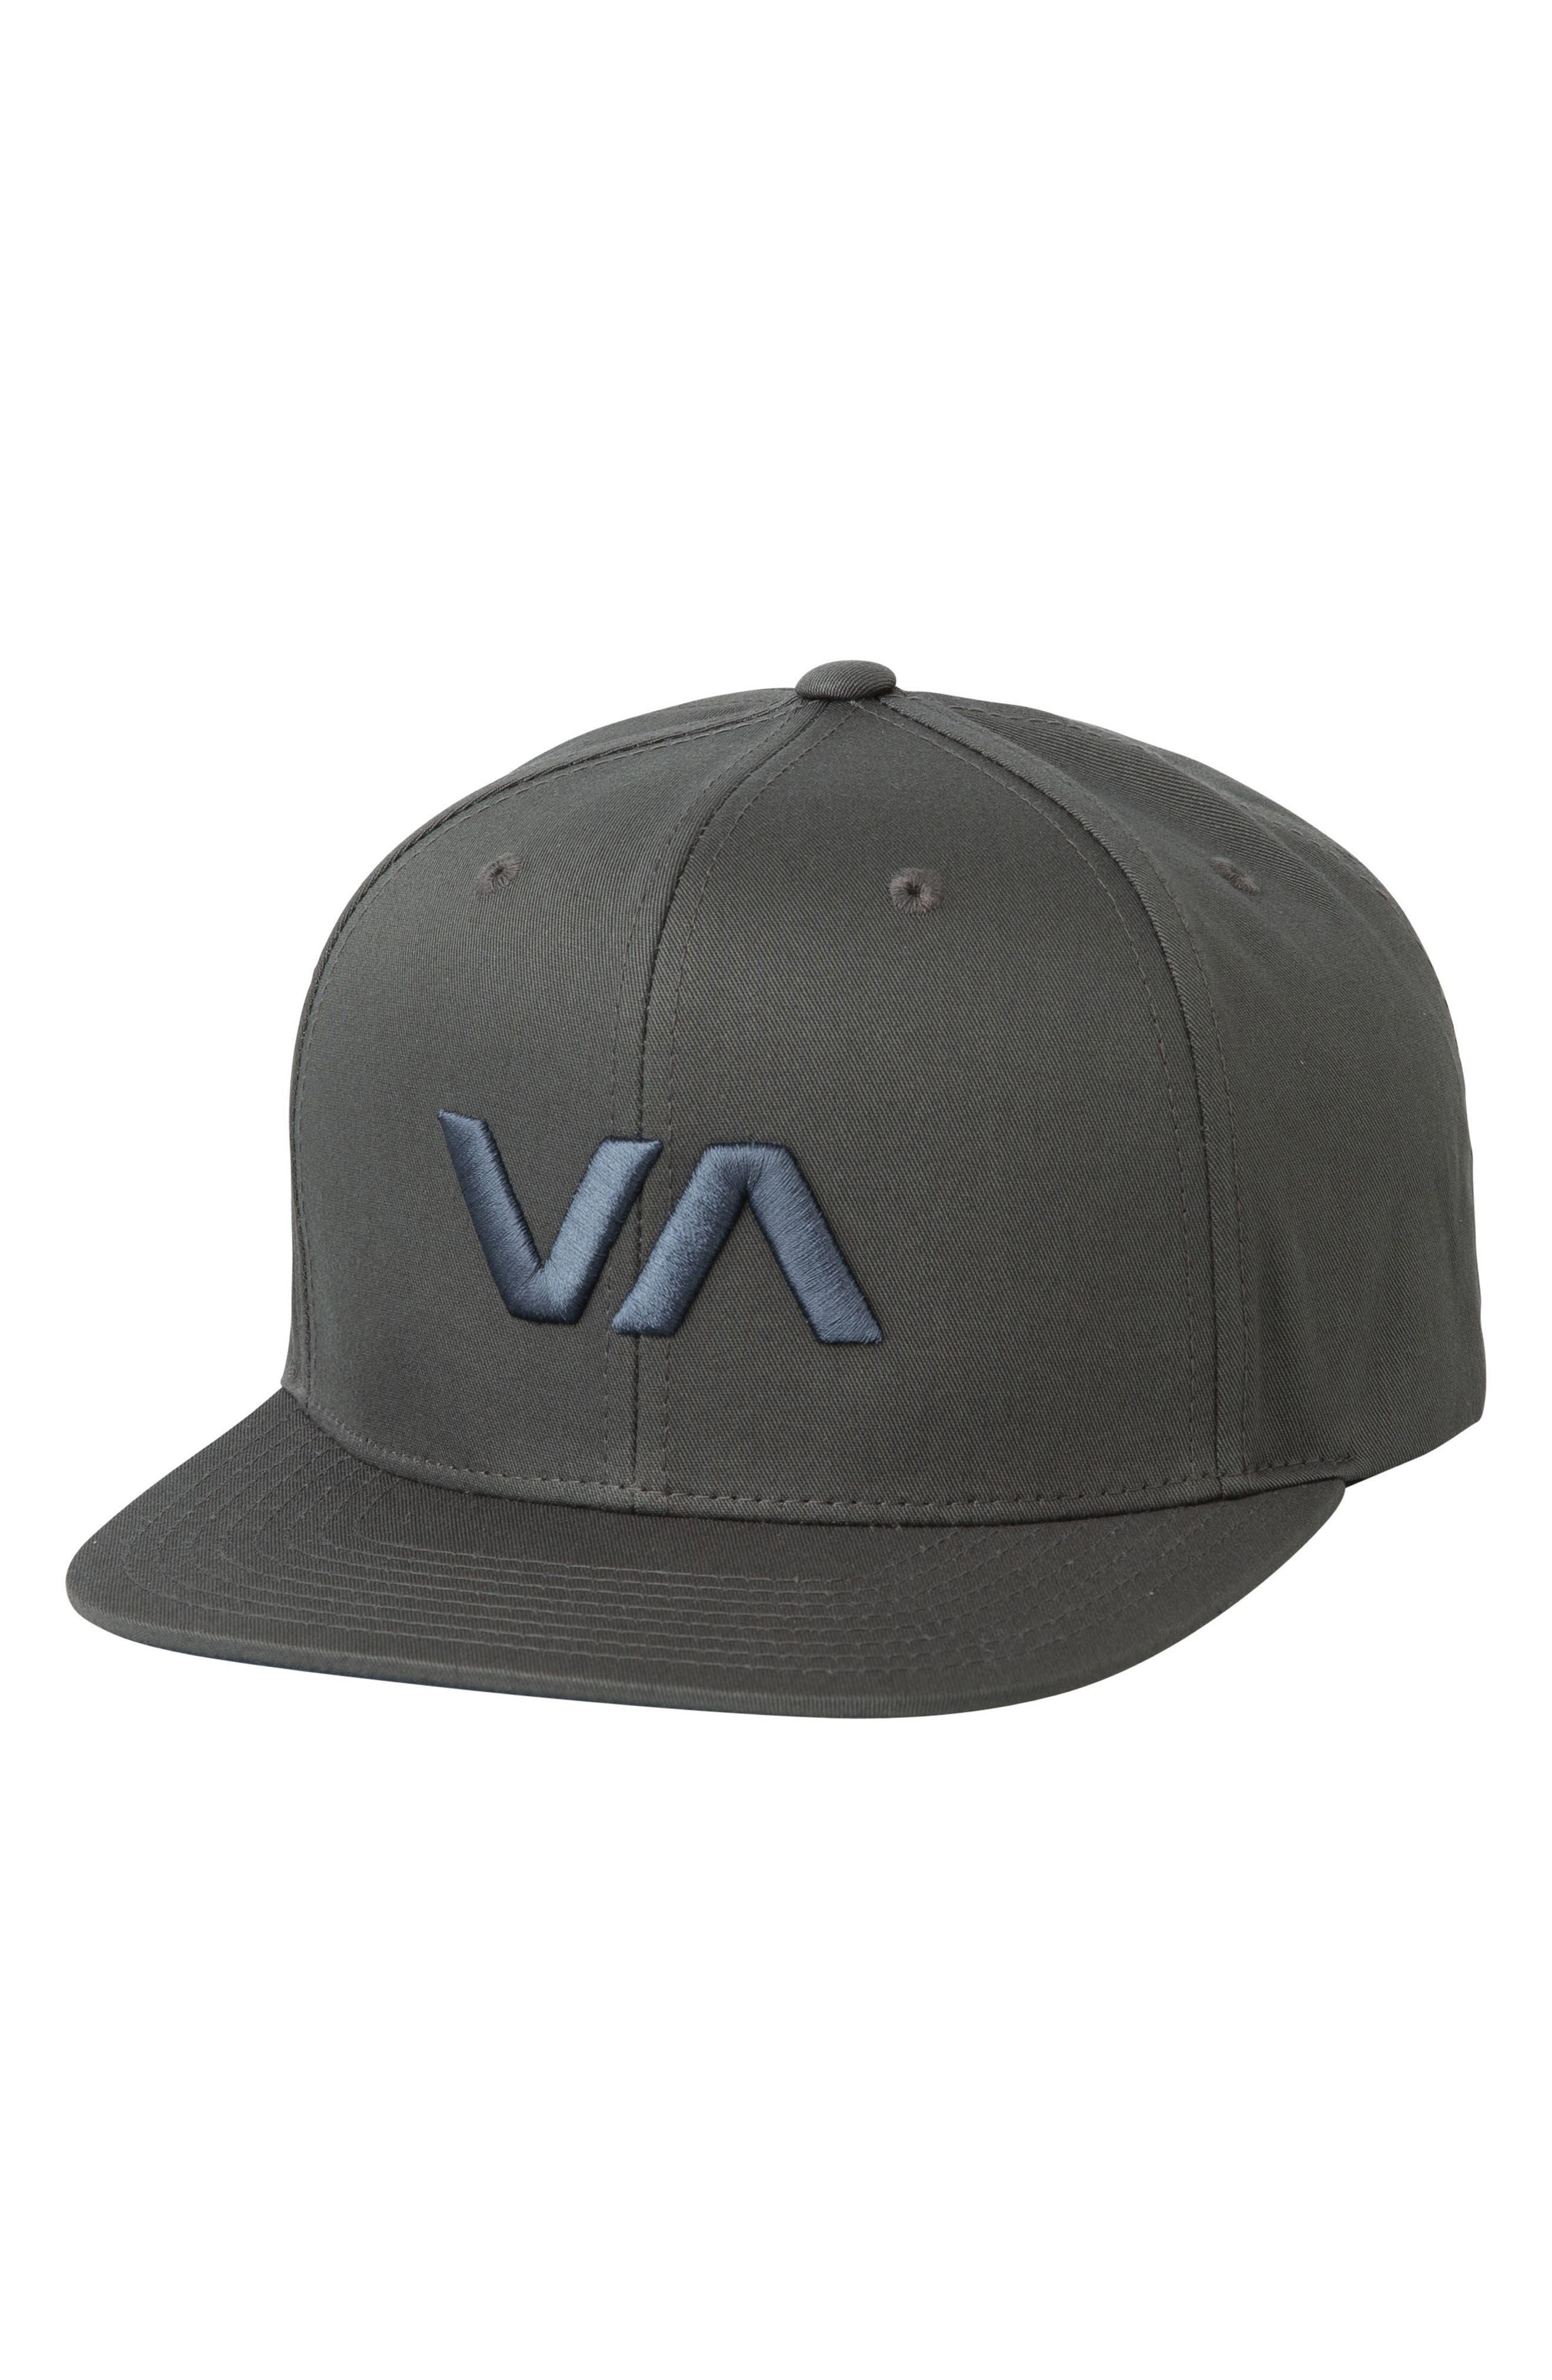 'VA' Snapback Hat,                             Main thumbnail 1, color,                             491